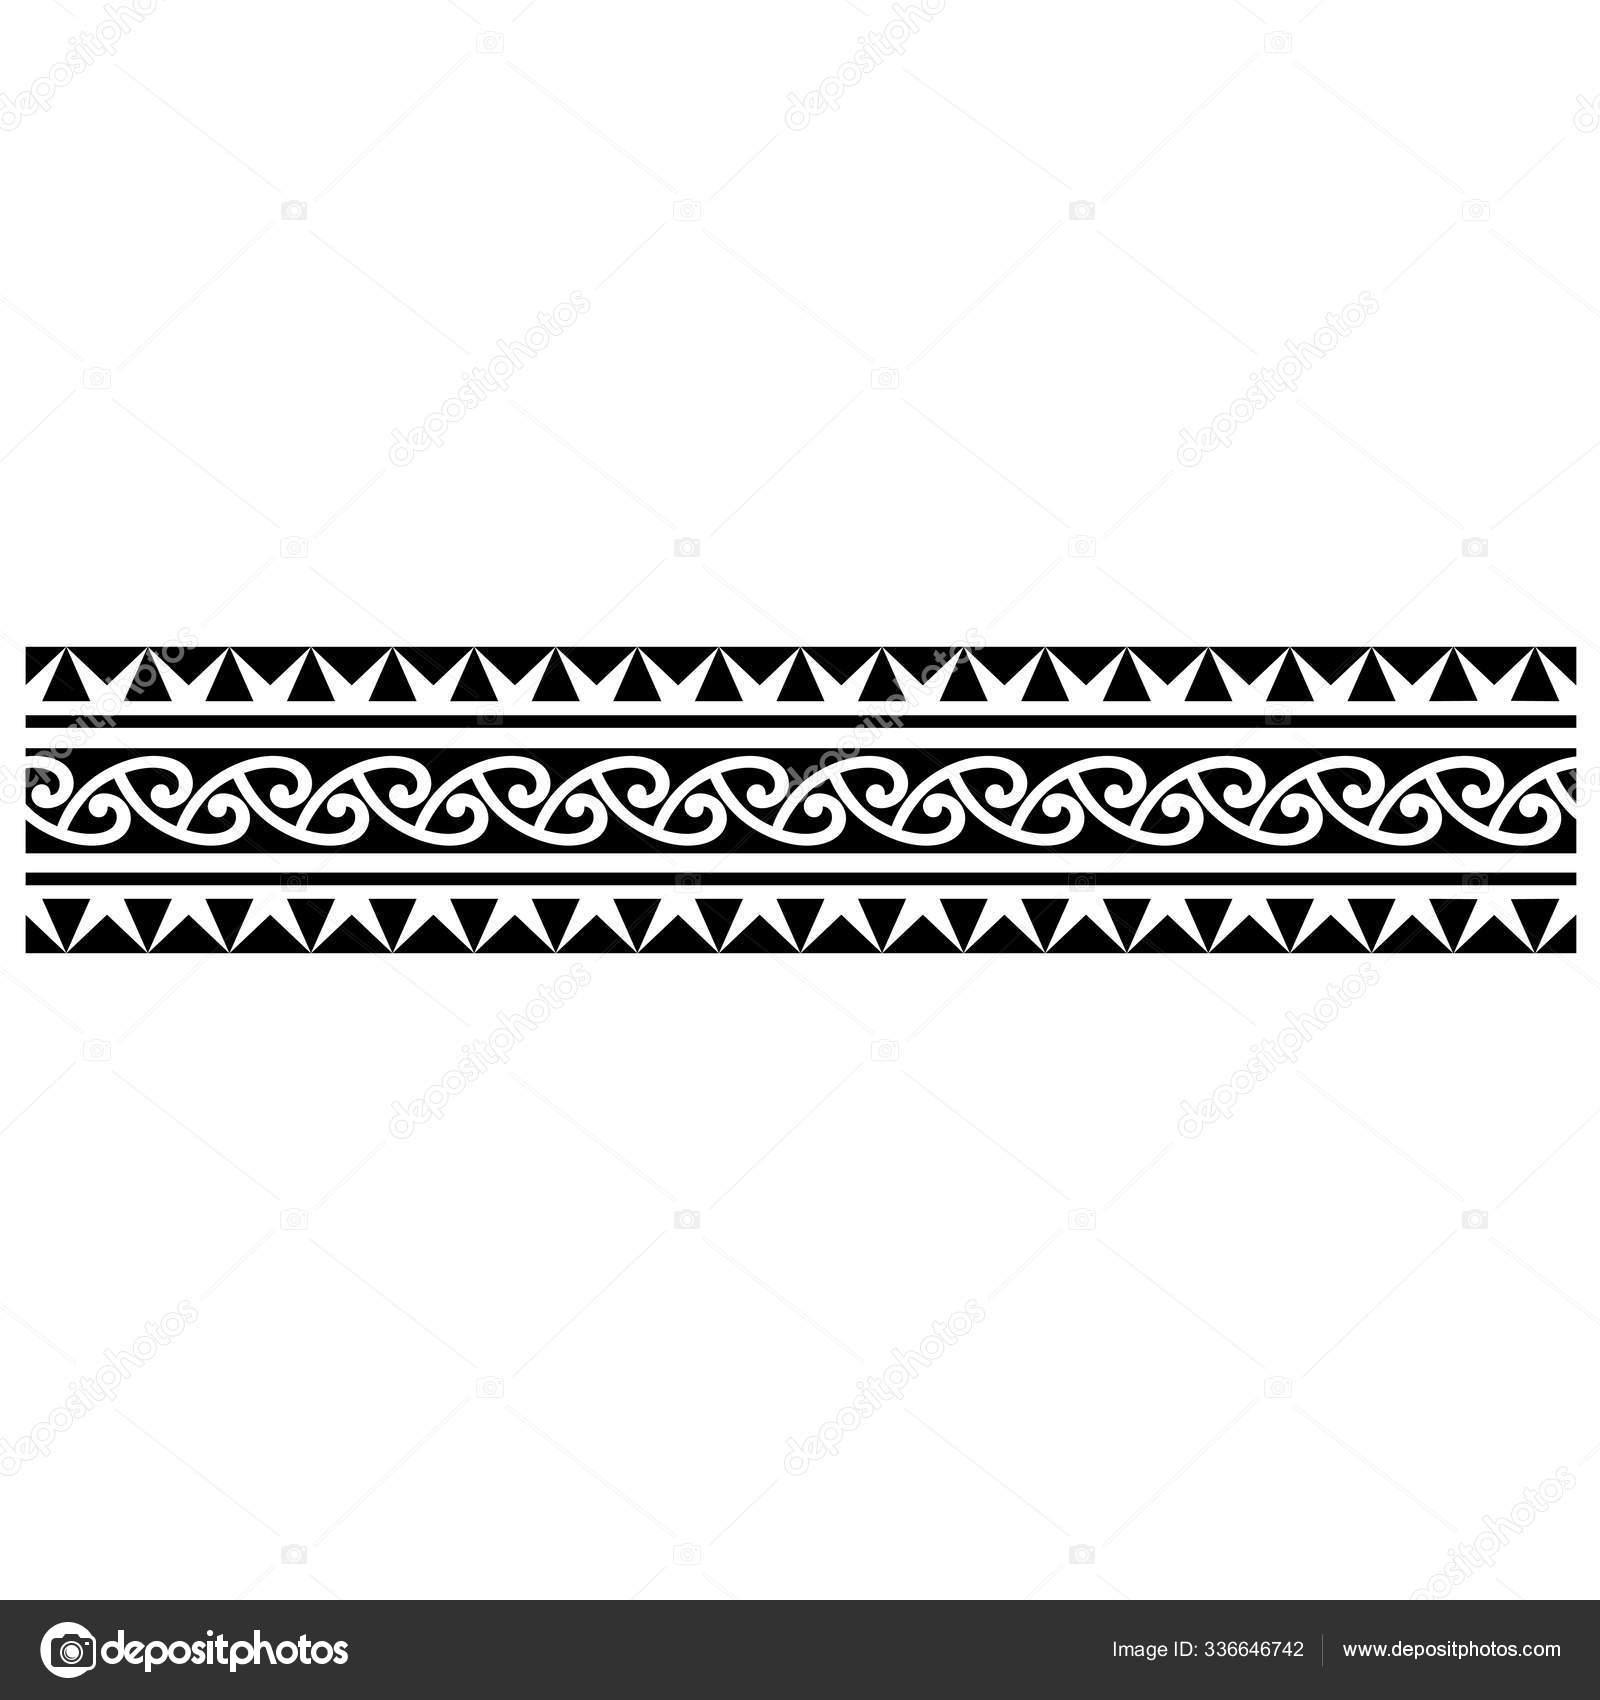 Tattoo Arm Band Tattoo Hand Band Maori Tattoo Maori Tribal Stock ...